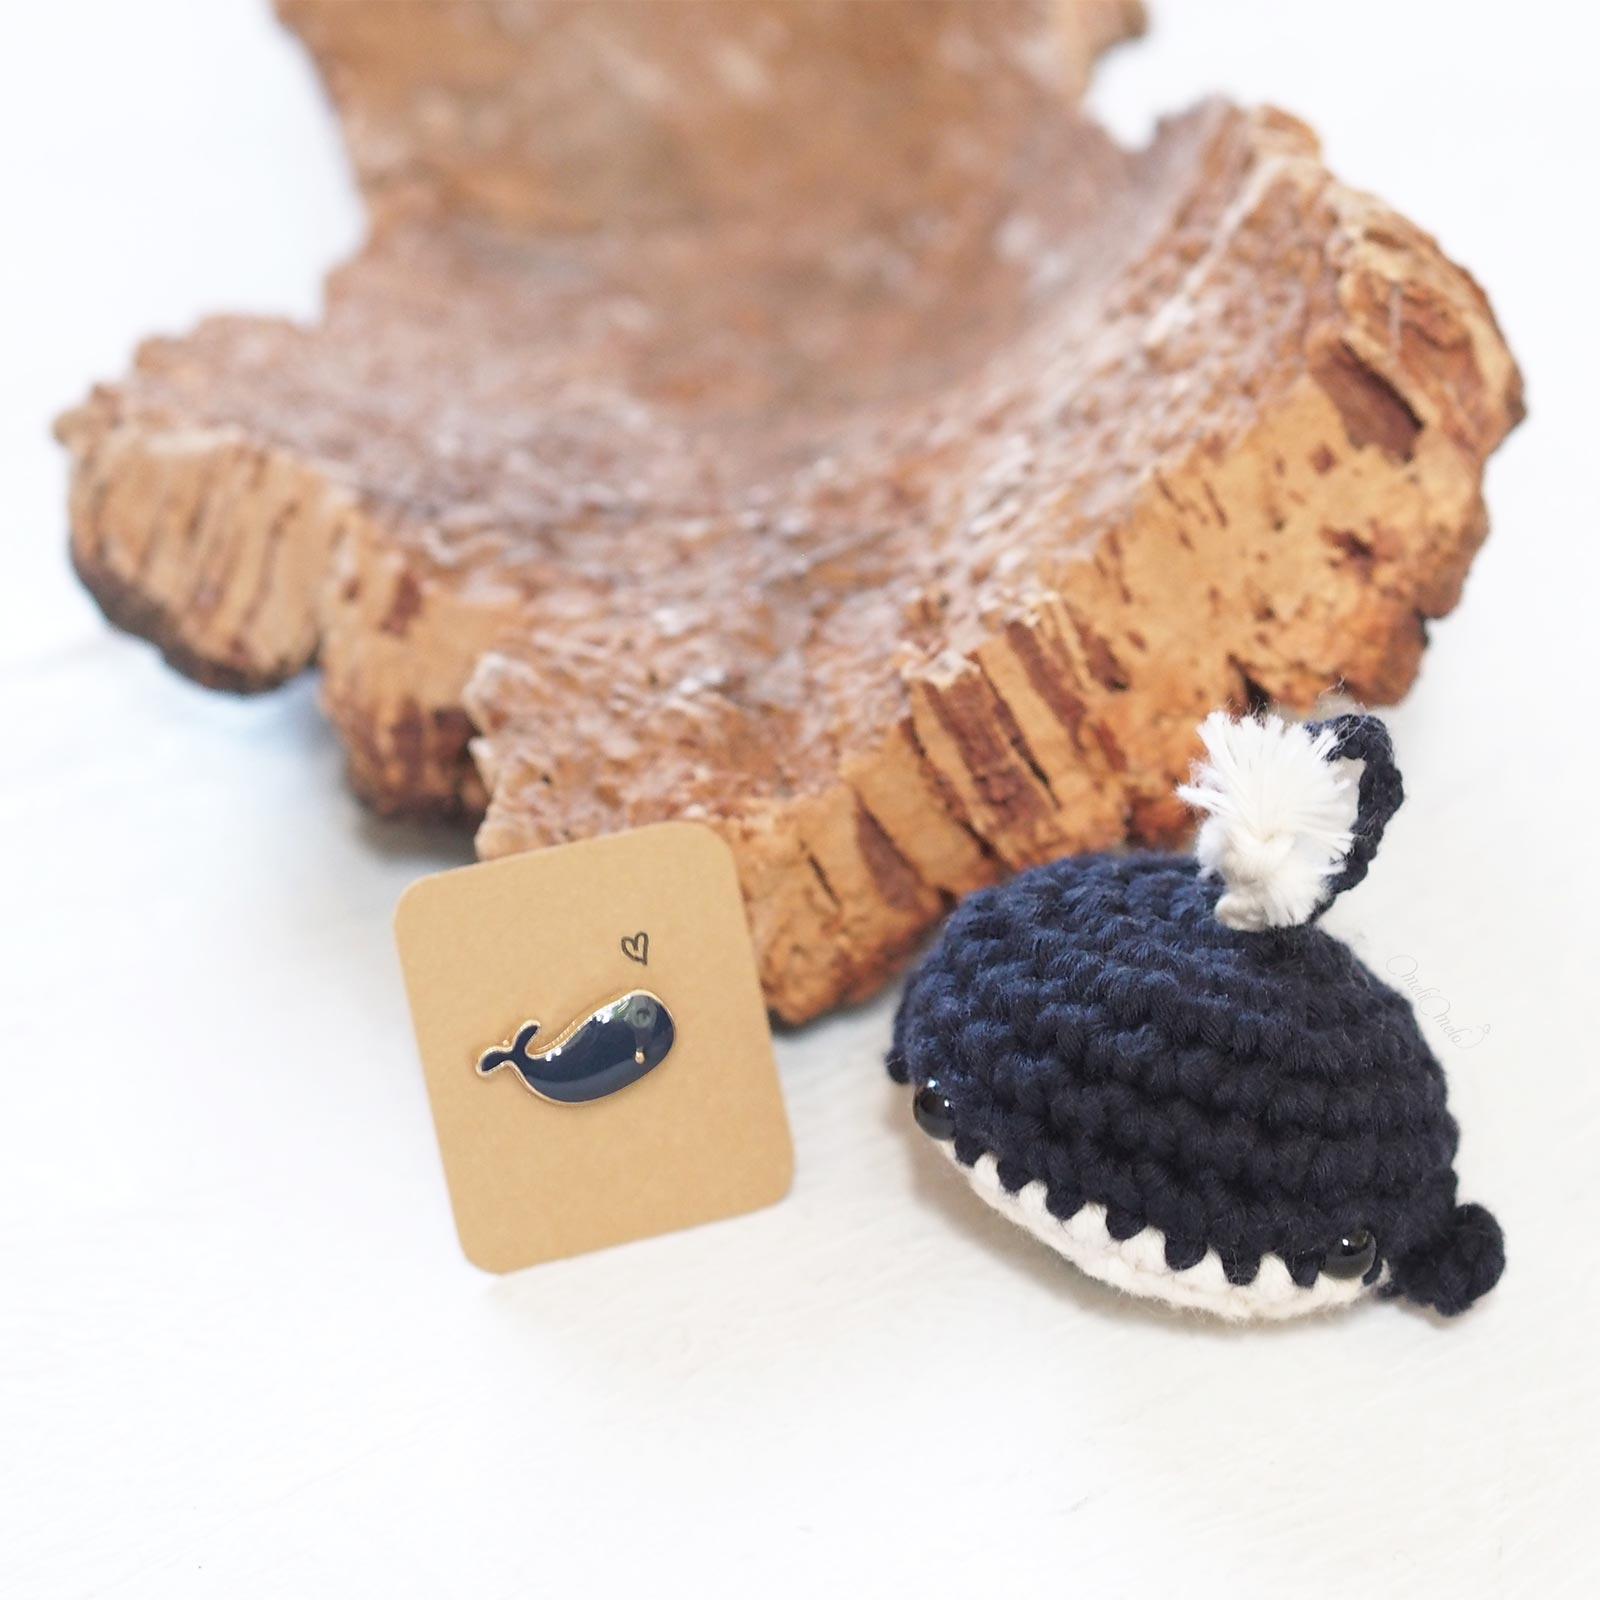 mini baleine crochet pins snail mail Elise teaforyoubijoux